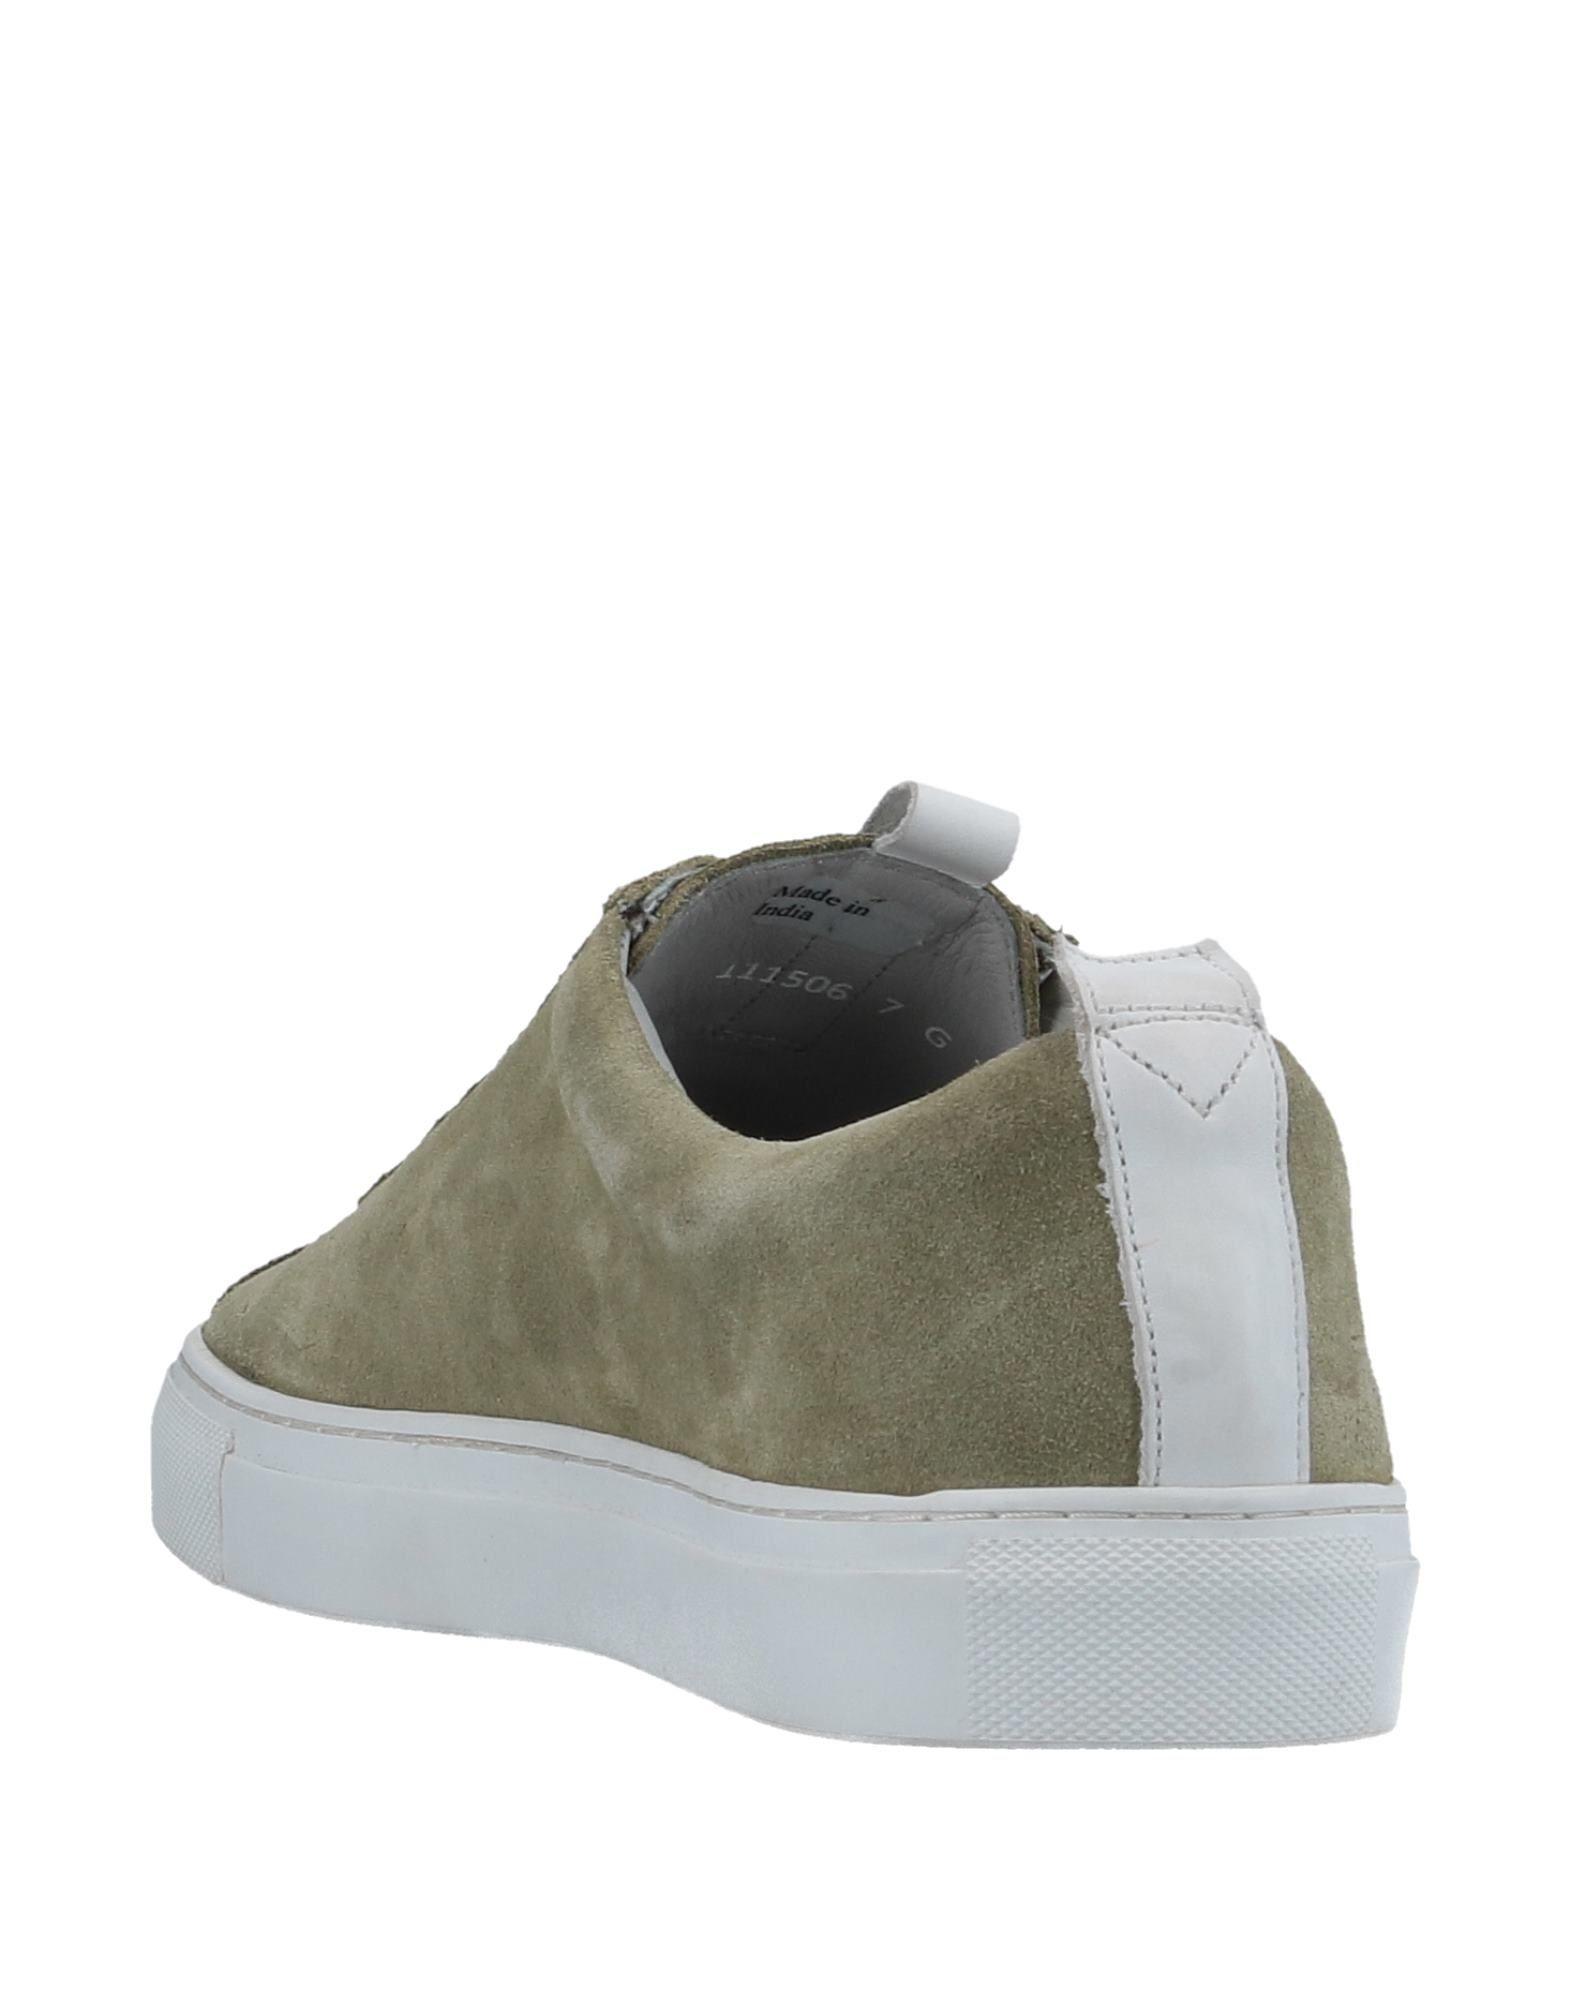 Grenson  Sneakers Herren  Grenson 11507891IE Heiße Schuhe 84ea19